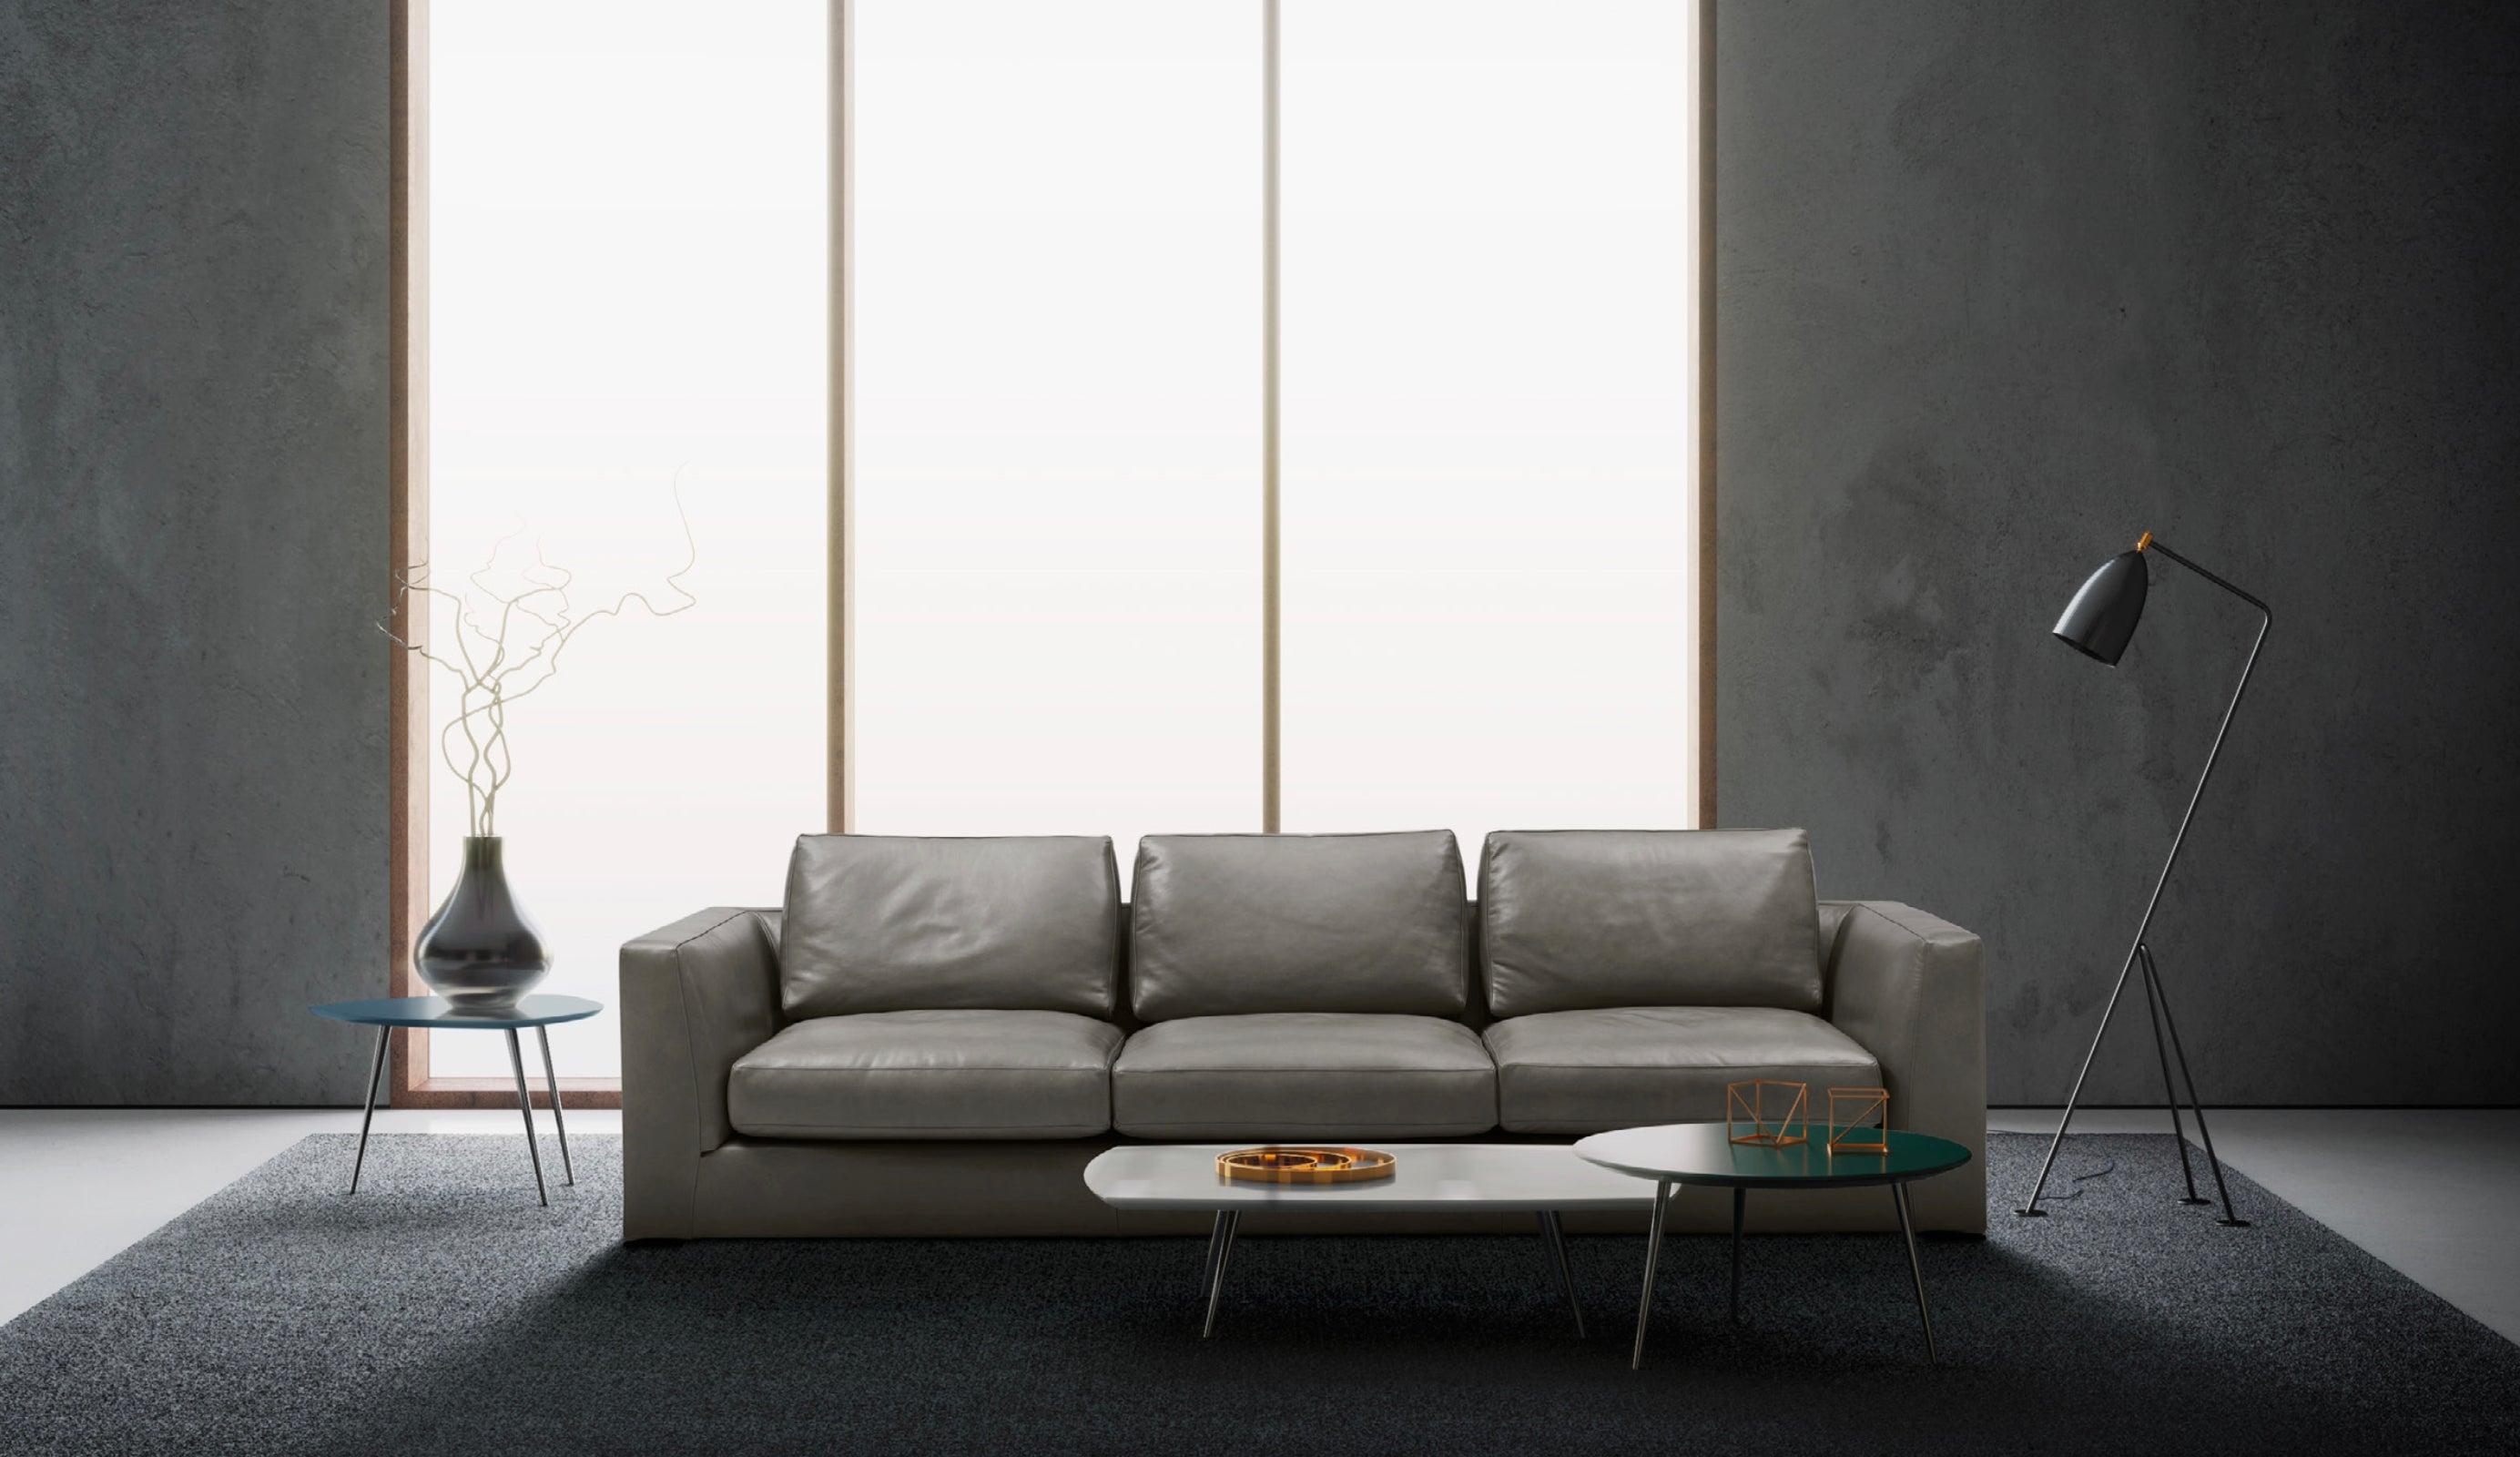 Italian Modular Designer Sofa Design Giulio Manzoni Made In Italy For At 1stdibs